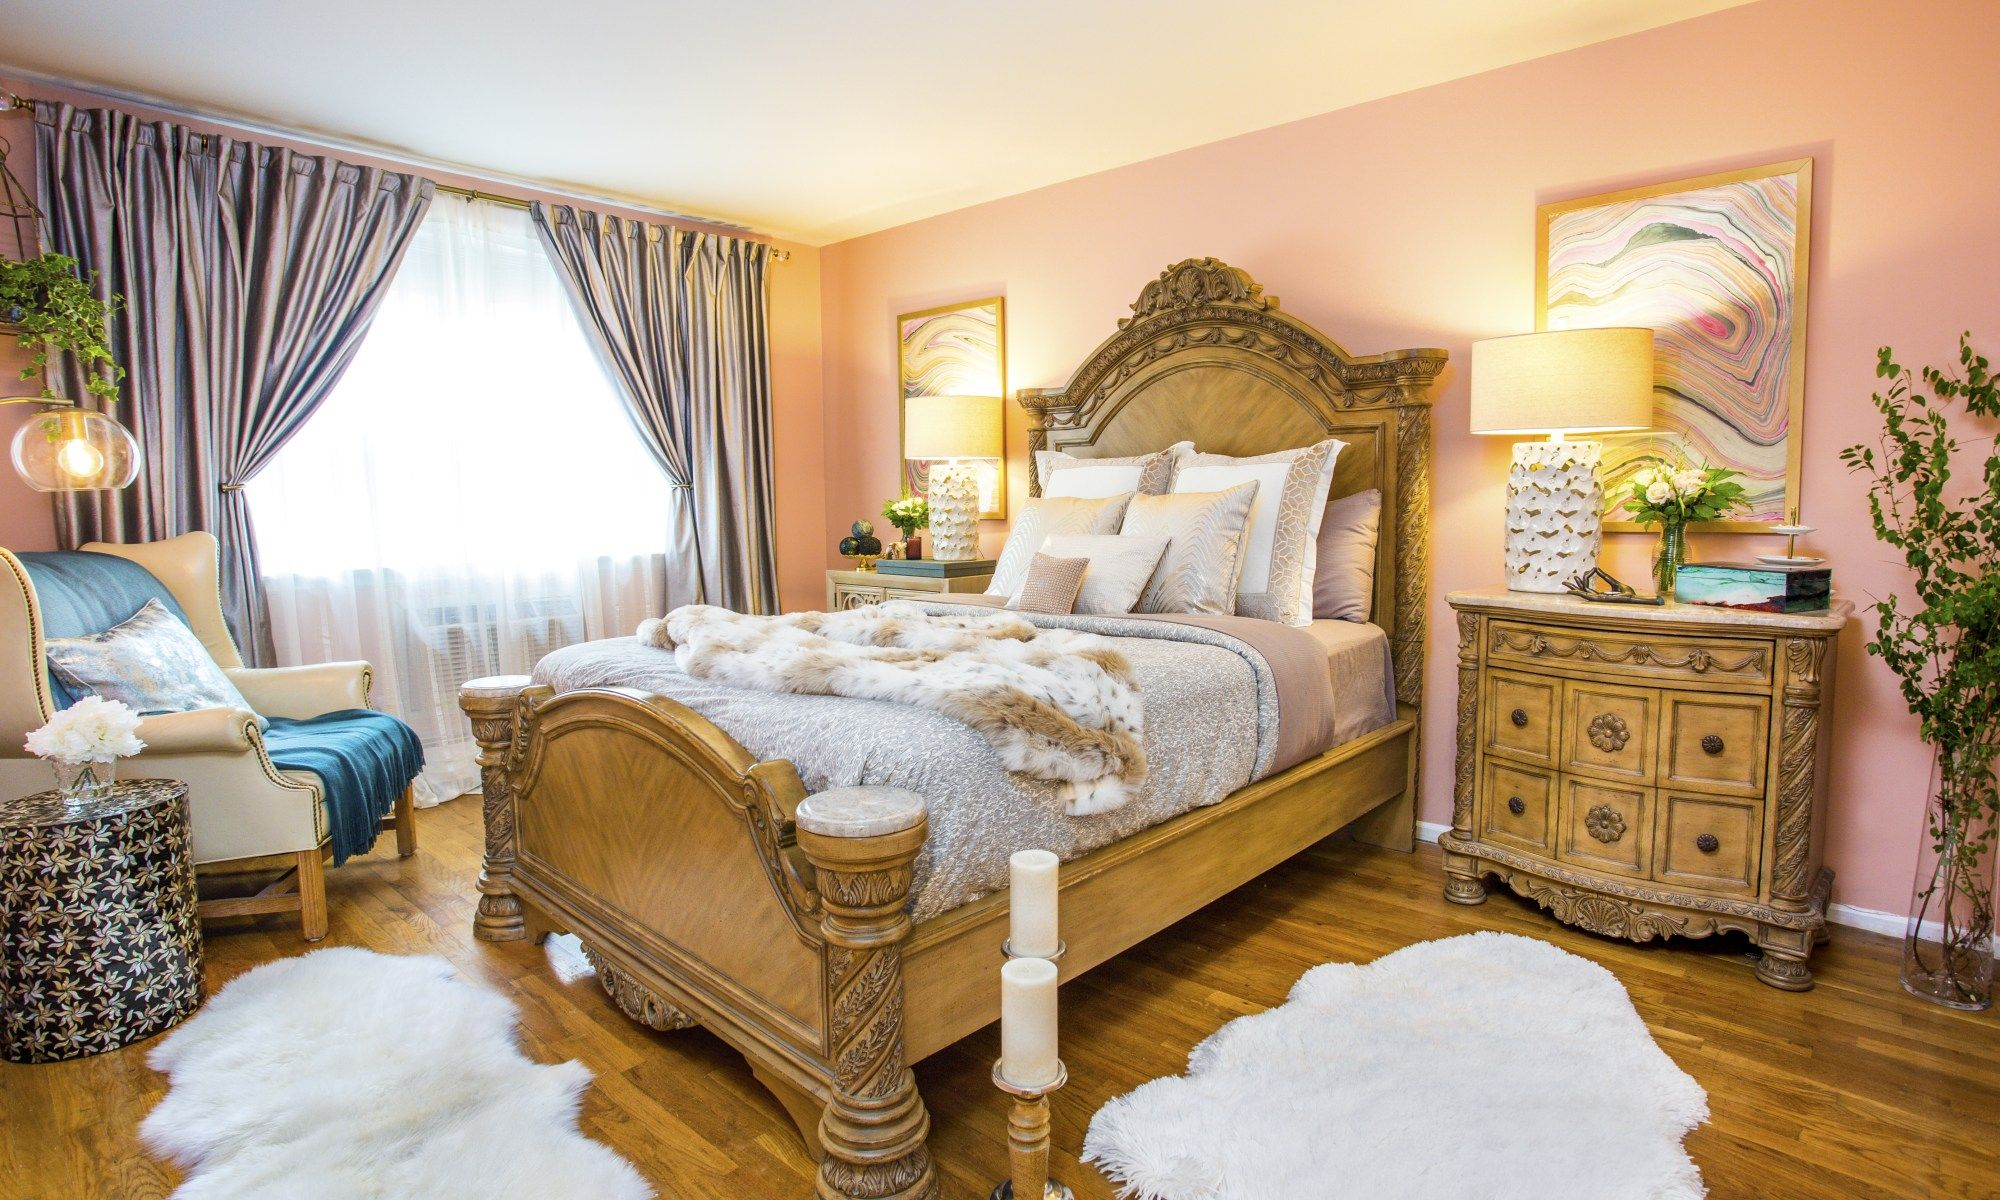 Traditional romantic master bedroom decor  Blog  Style by Mimi G Interior Decorator Airmont NY Blush walls